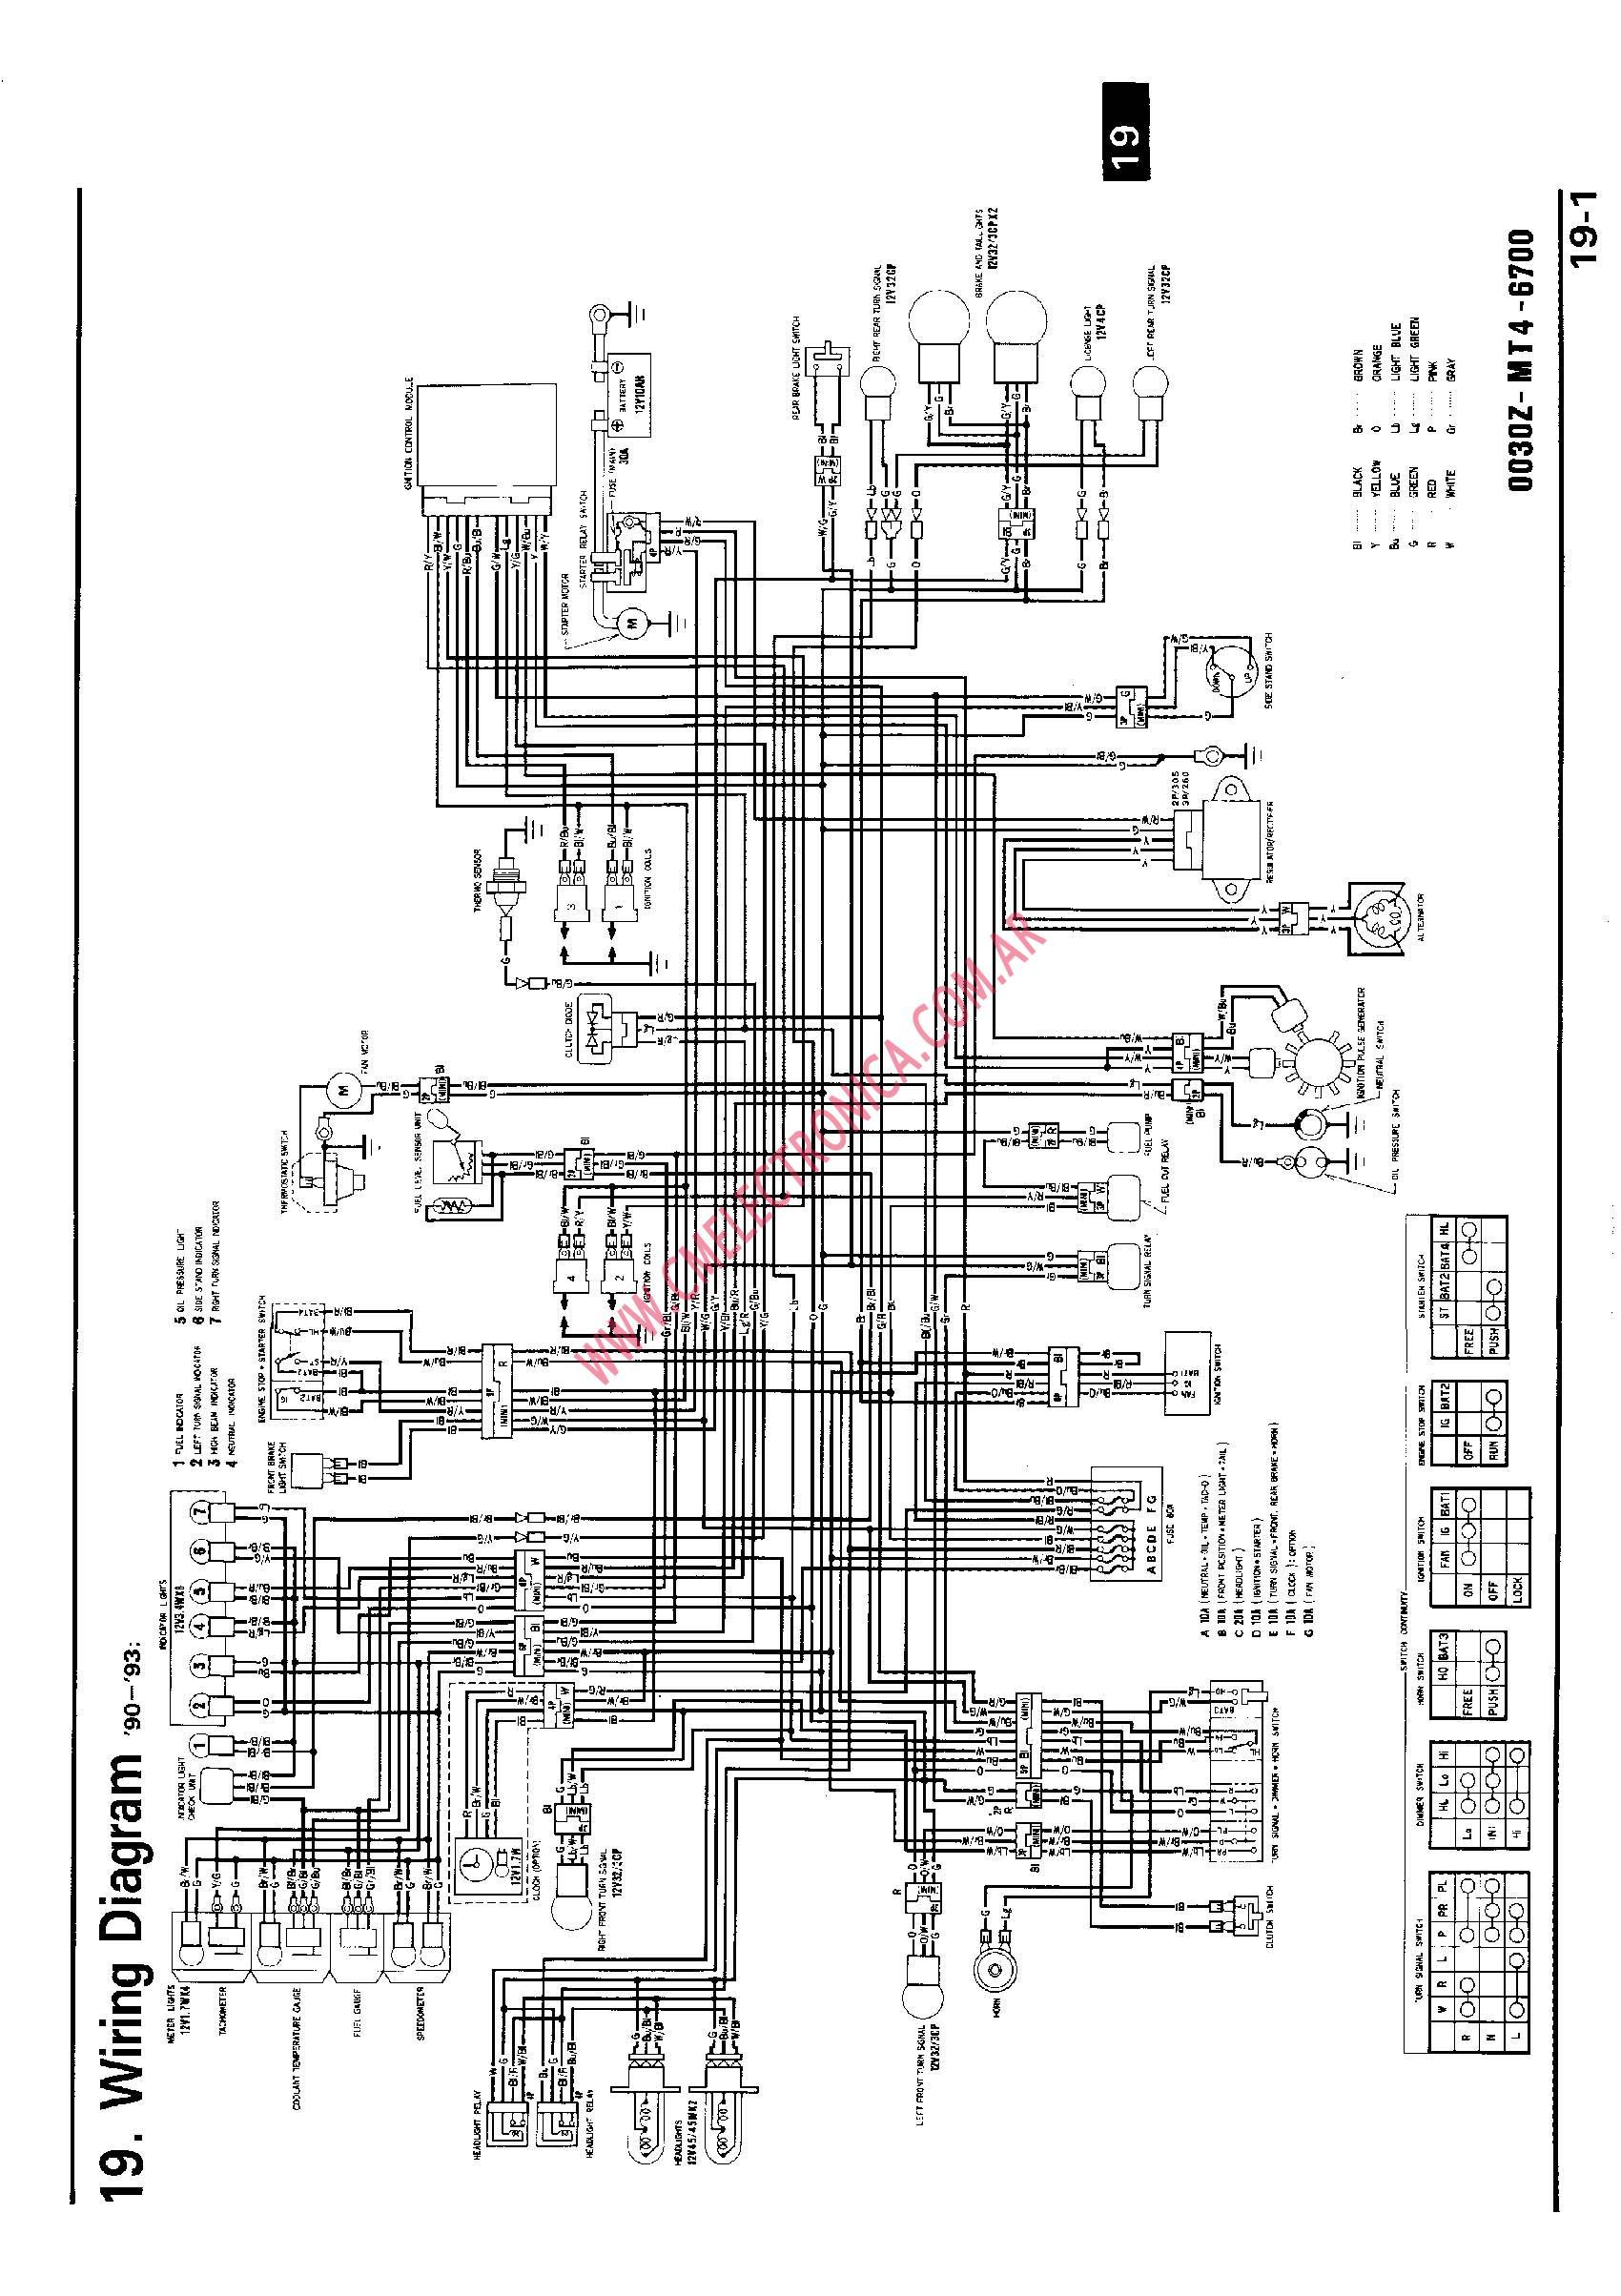 Honda Vfr 750 Wiring Diagram Wiring Diagram Data Today